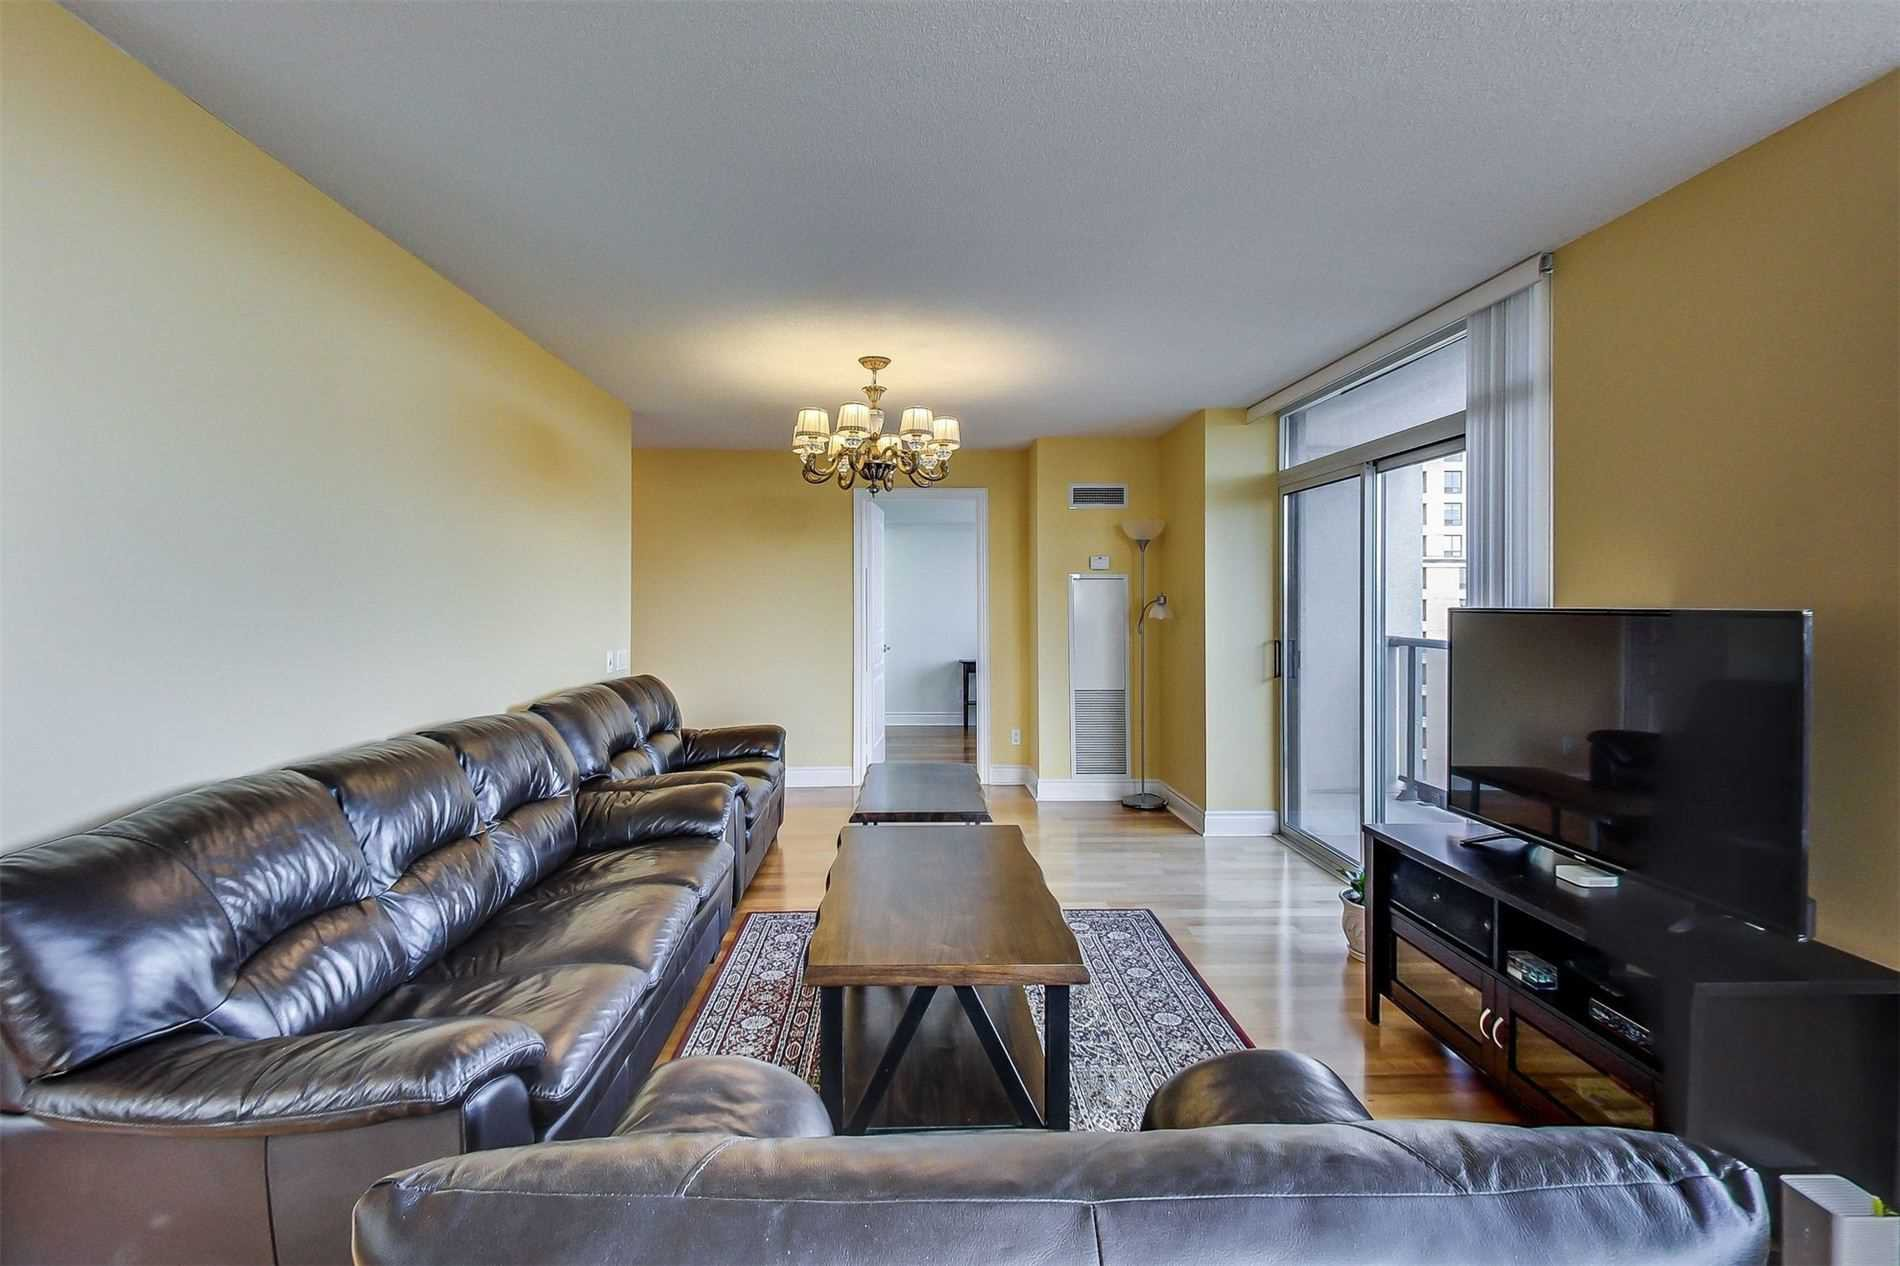 Photo 4: Photos: 1204 10 Northtown Way in Toronto: Willowdale East Condo for sale (Toronto C14)  : MLS®# C4648371